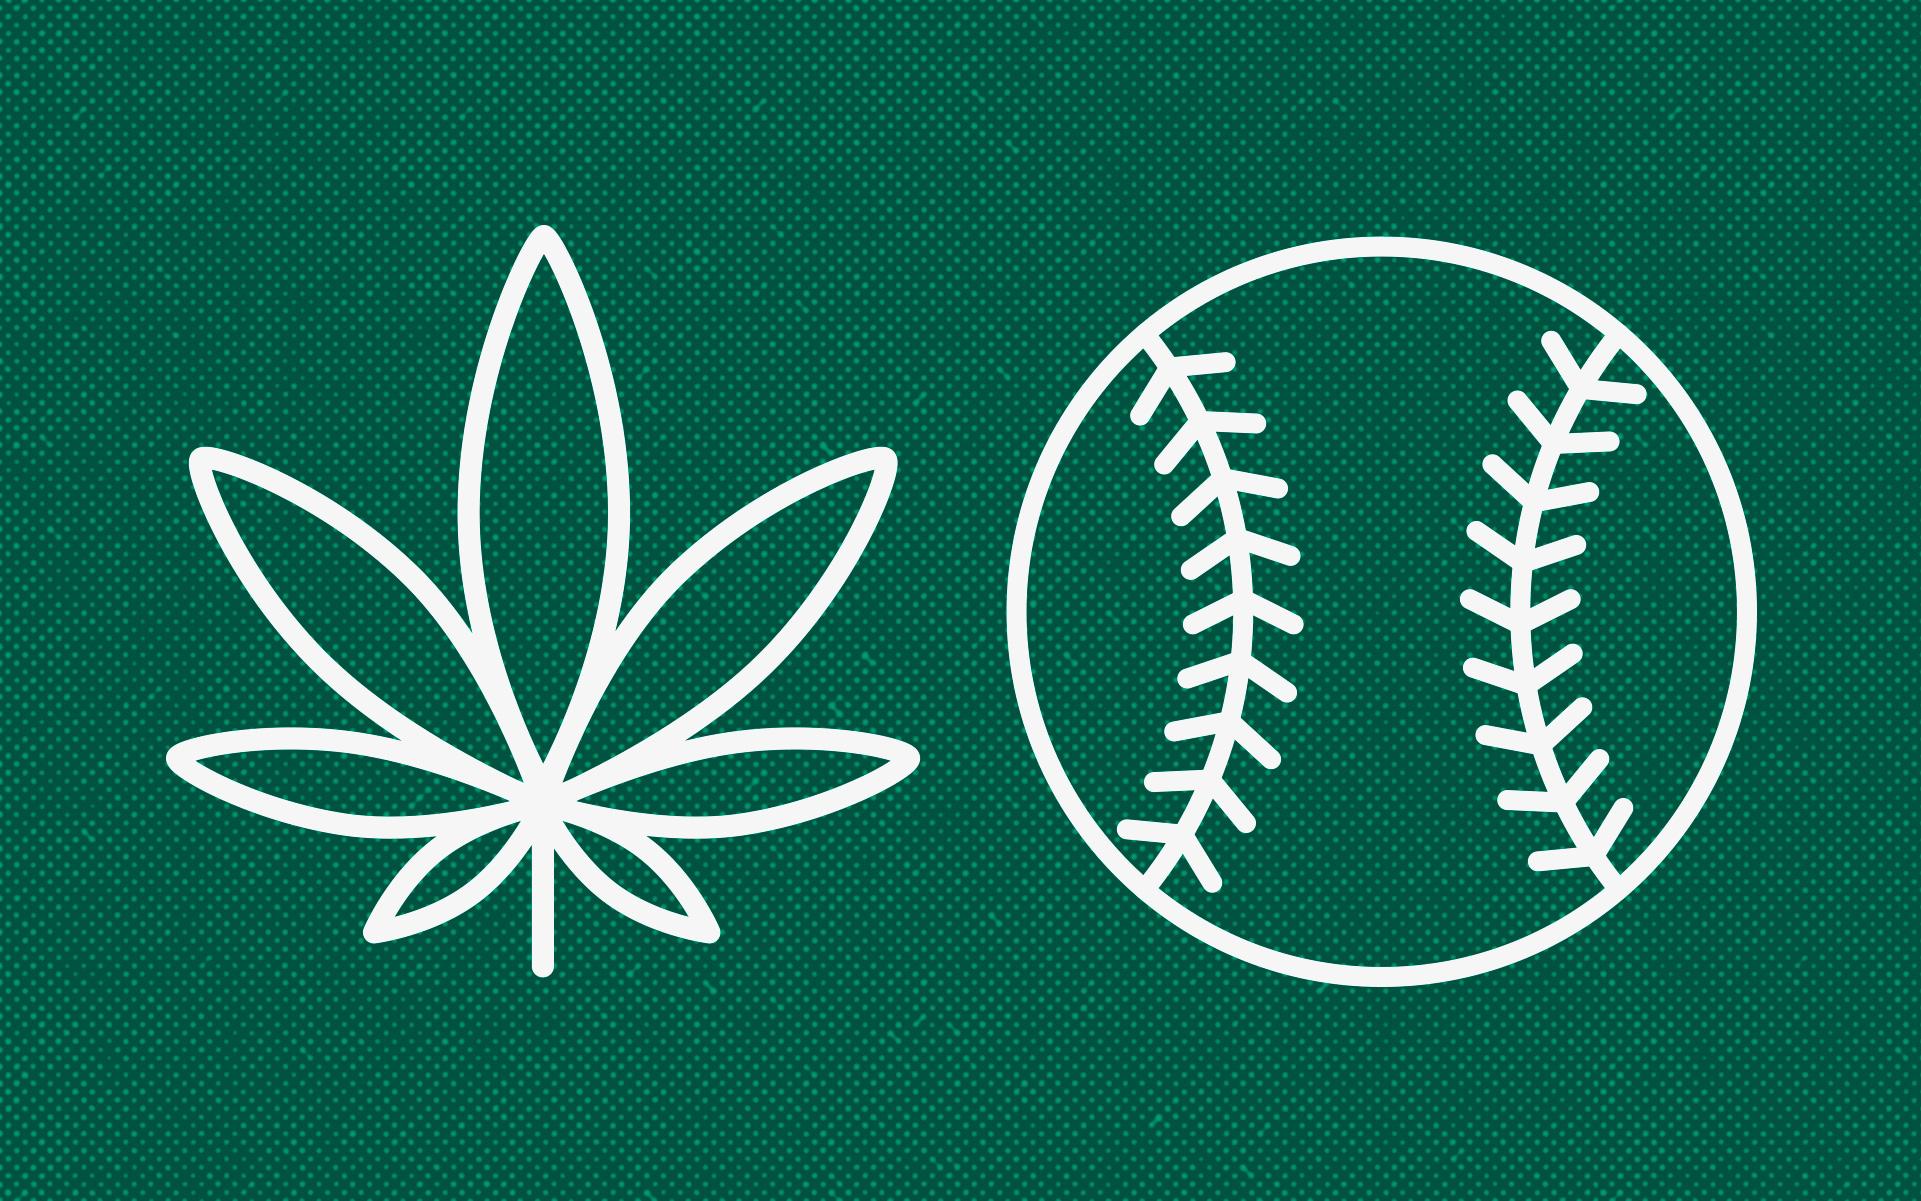 mlb banned substances, marijuana use in sports, baseball, pot